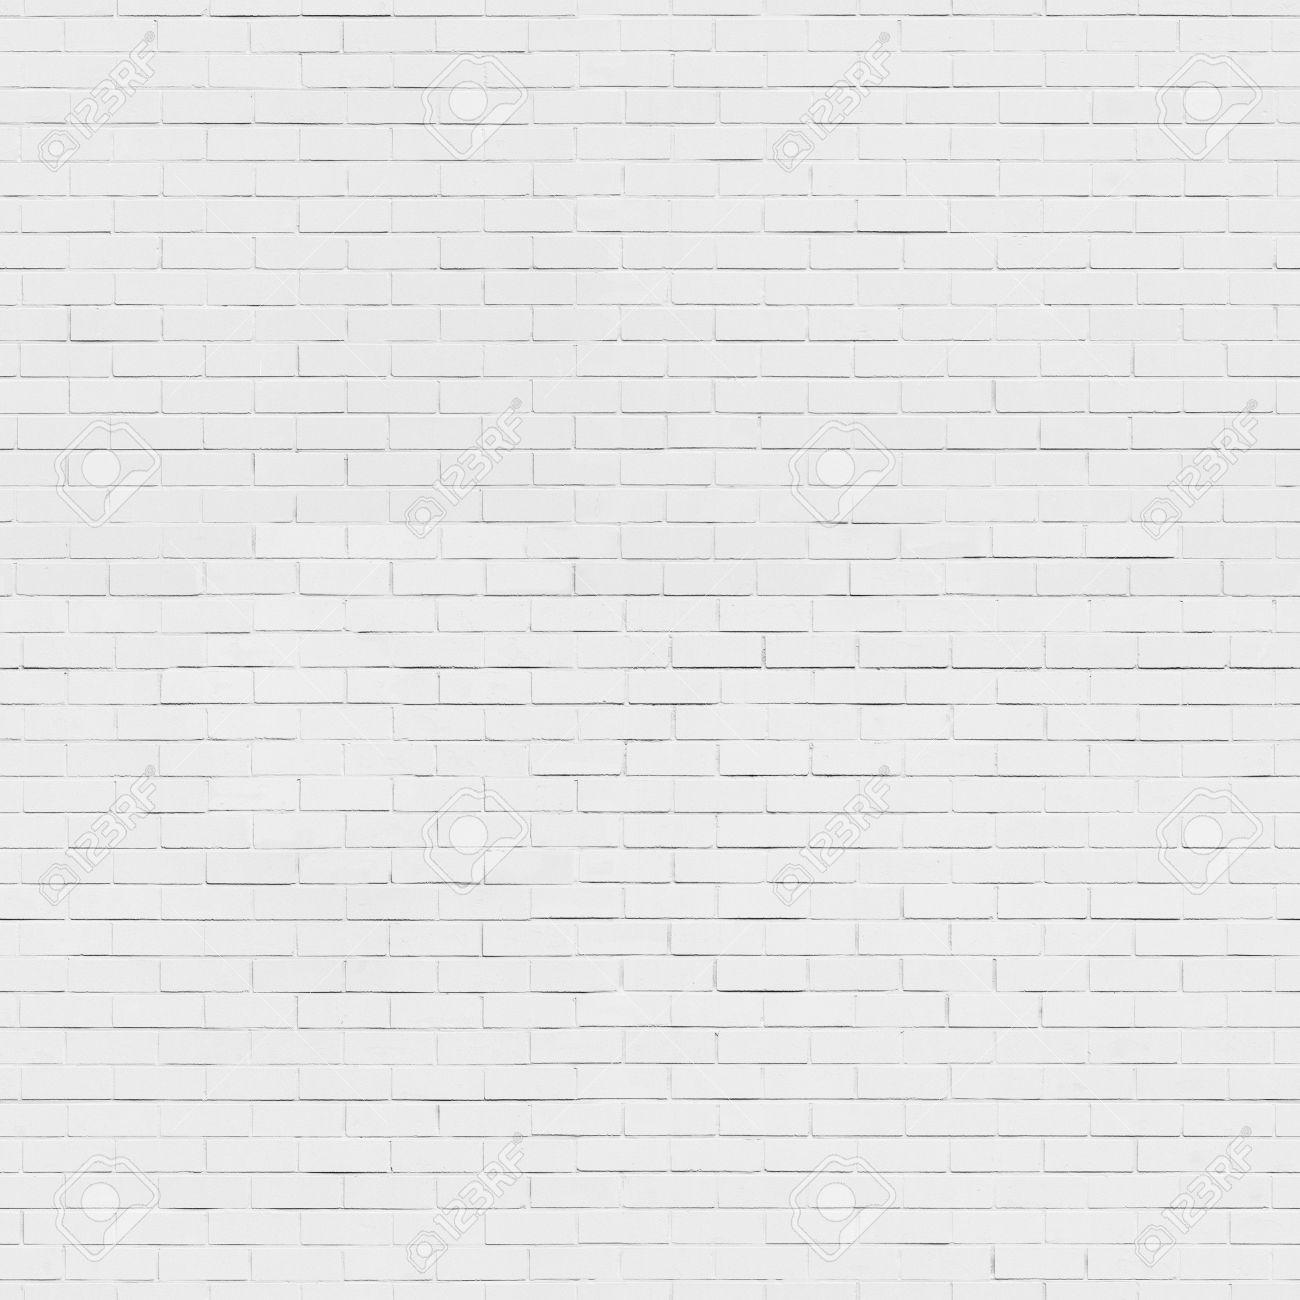 Seamless white brick wall background, texture Stock Photo - 38641507